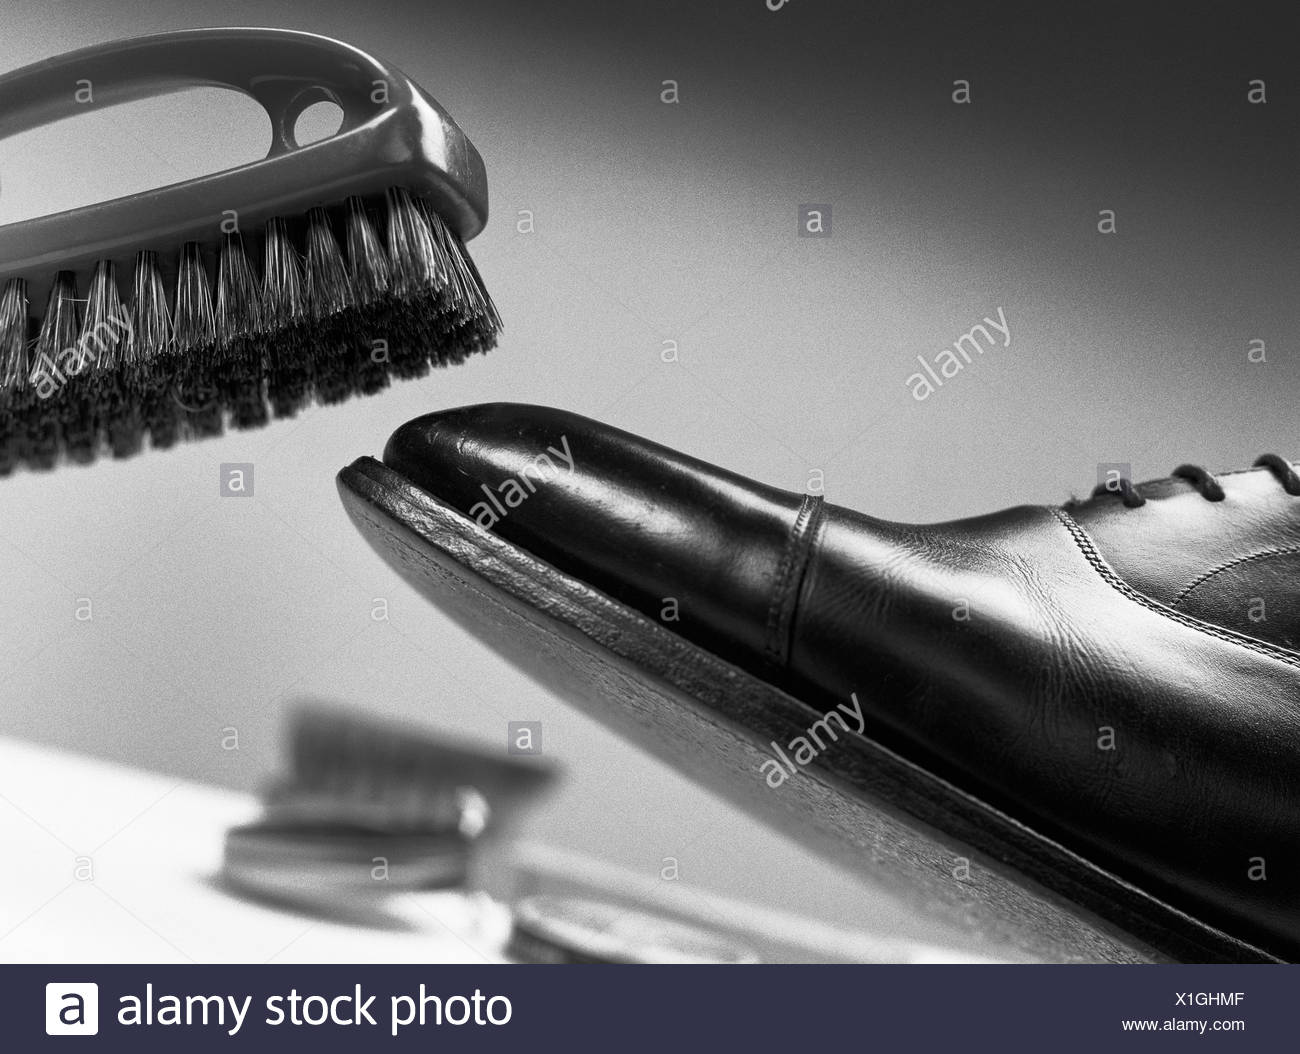 Chaussure en cuir de brossage, close-up Photo Stock